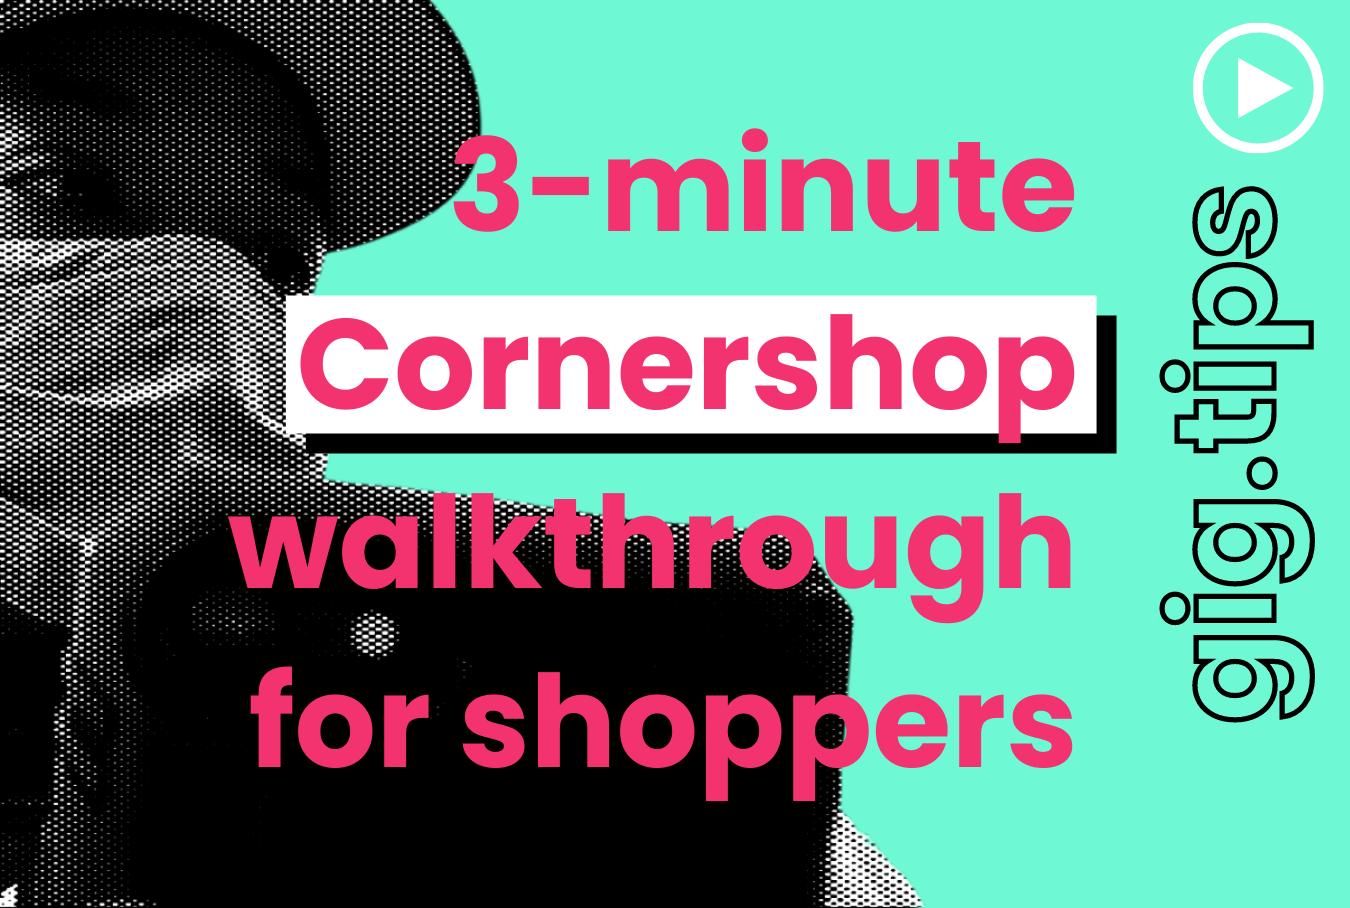 3-minute Cornershop walkthrough for shoppers